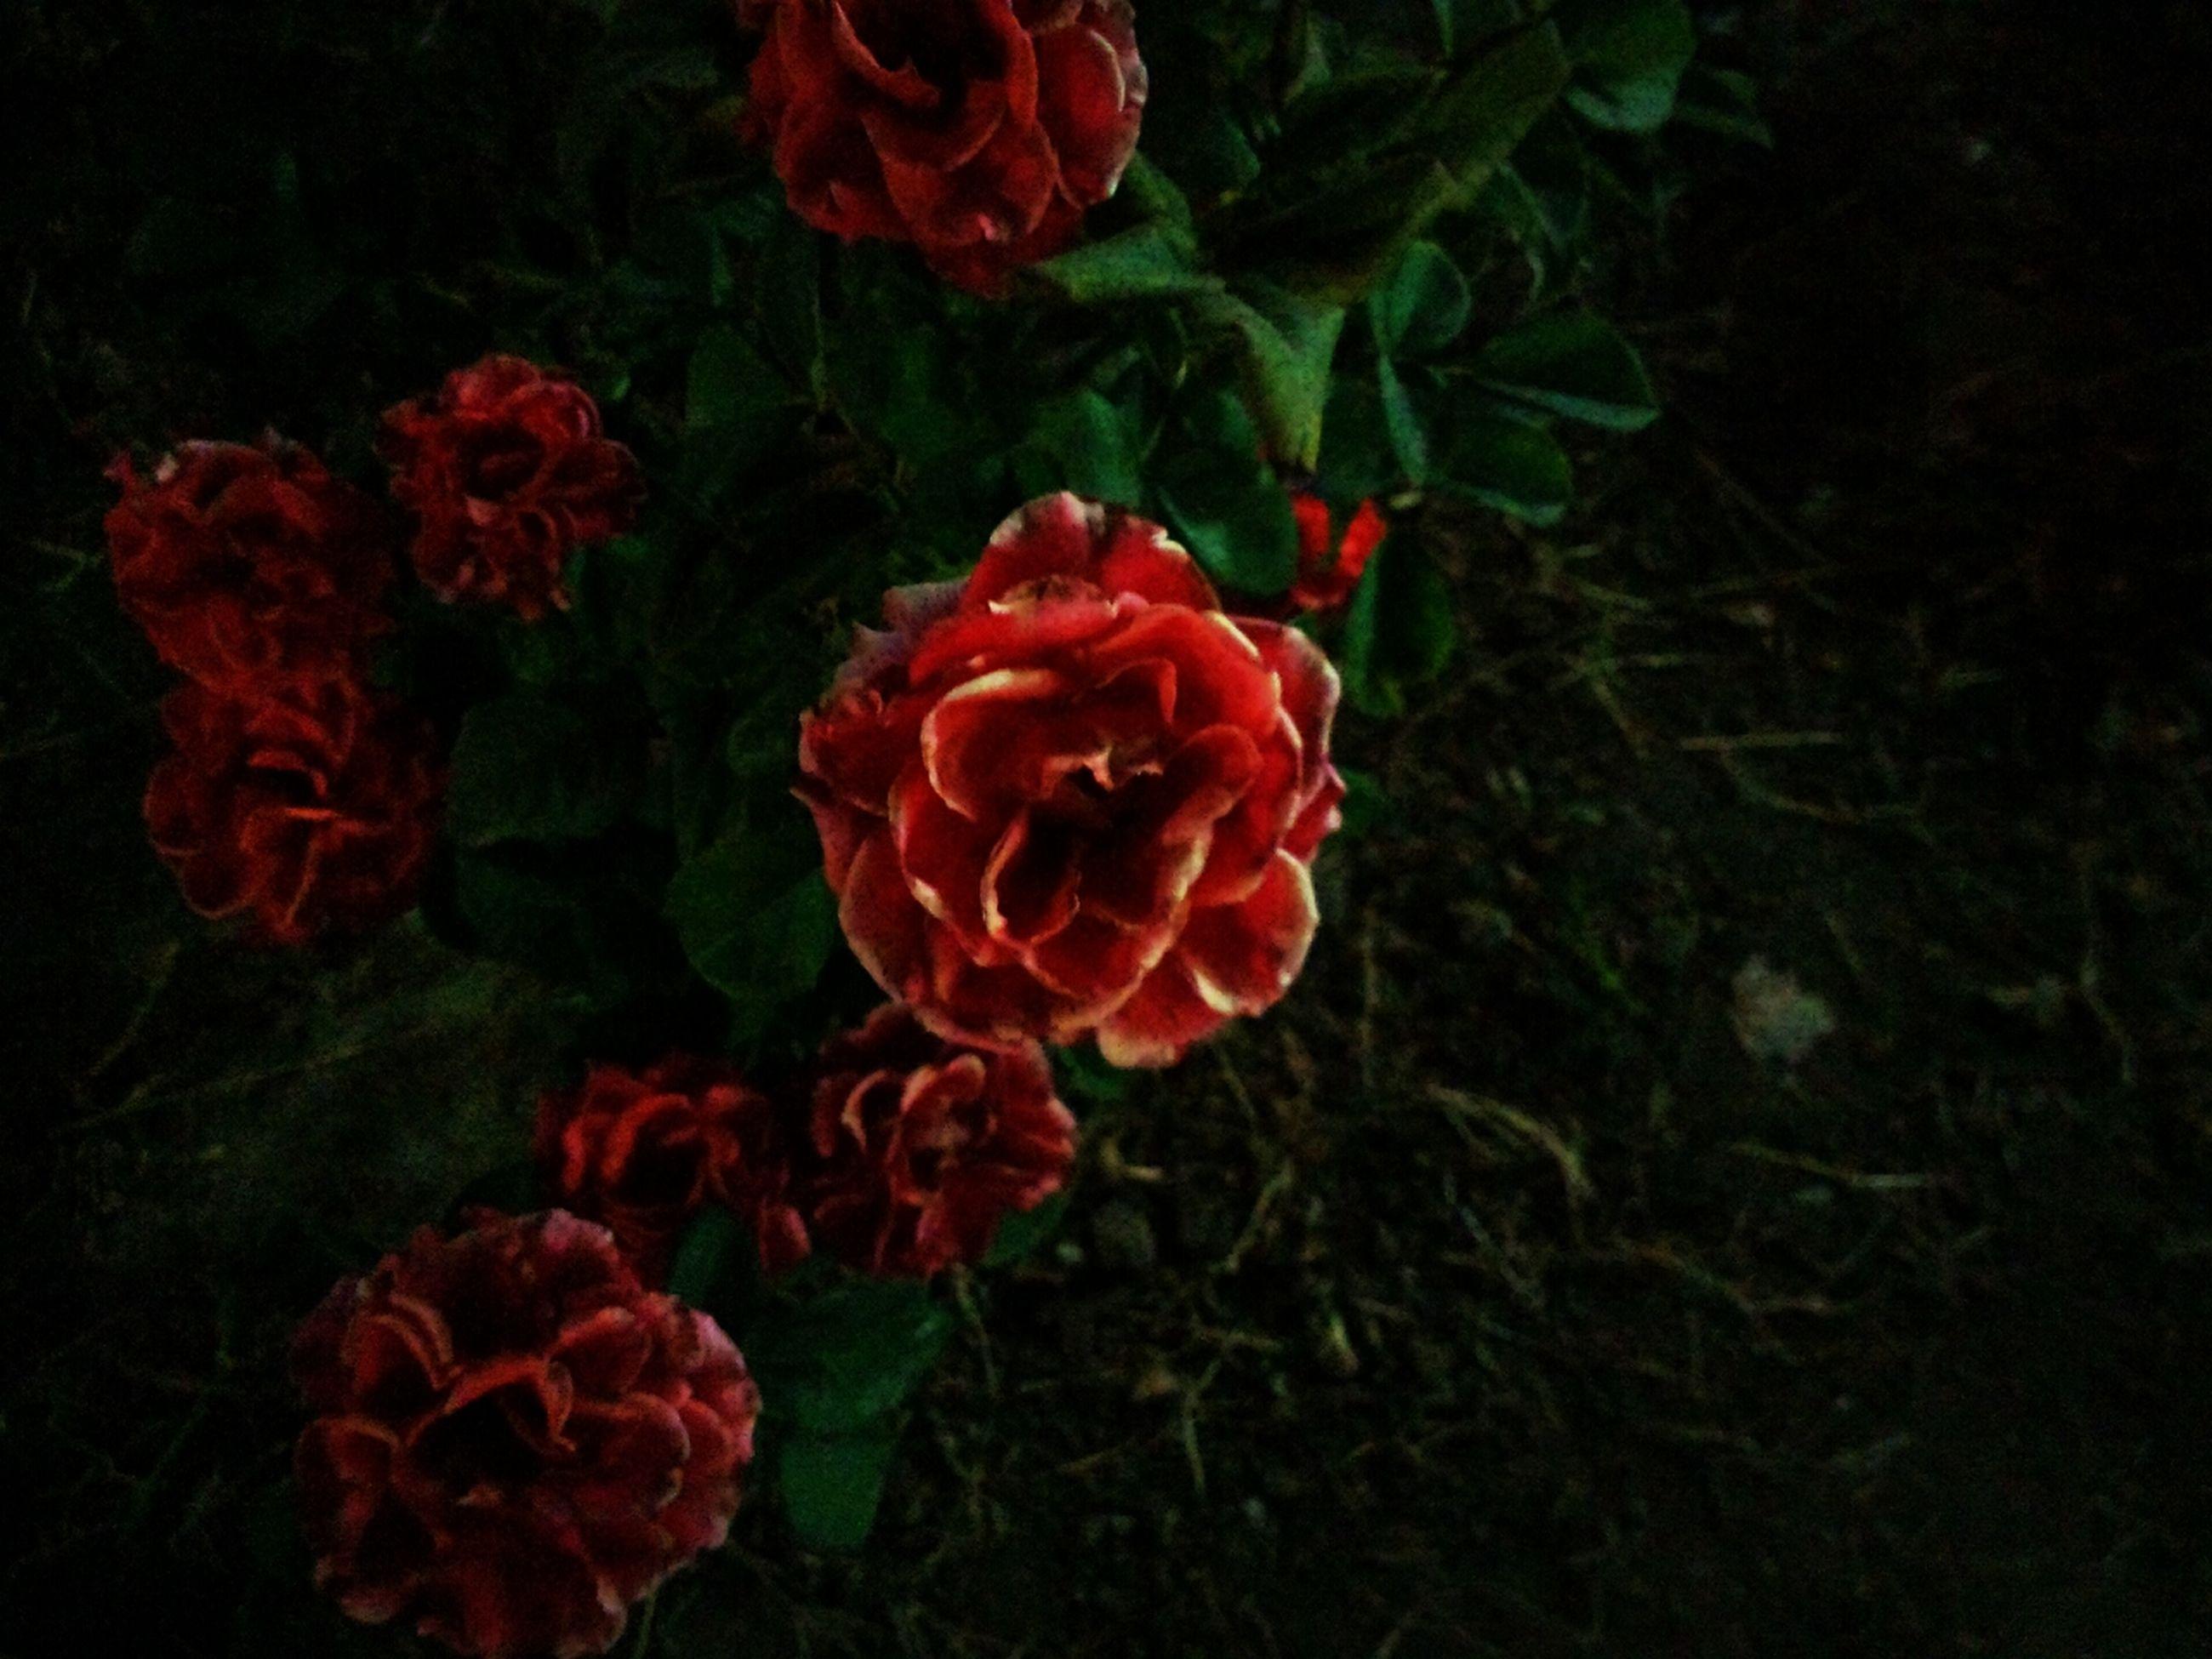 flower, red, petal, freshness, fragility, flower head, growth, beauty in nature, rose - flower, plant, close-up, nature, blooming, rose, black background, studio shot, in bloom, leaf, orange color, stem